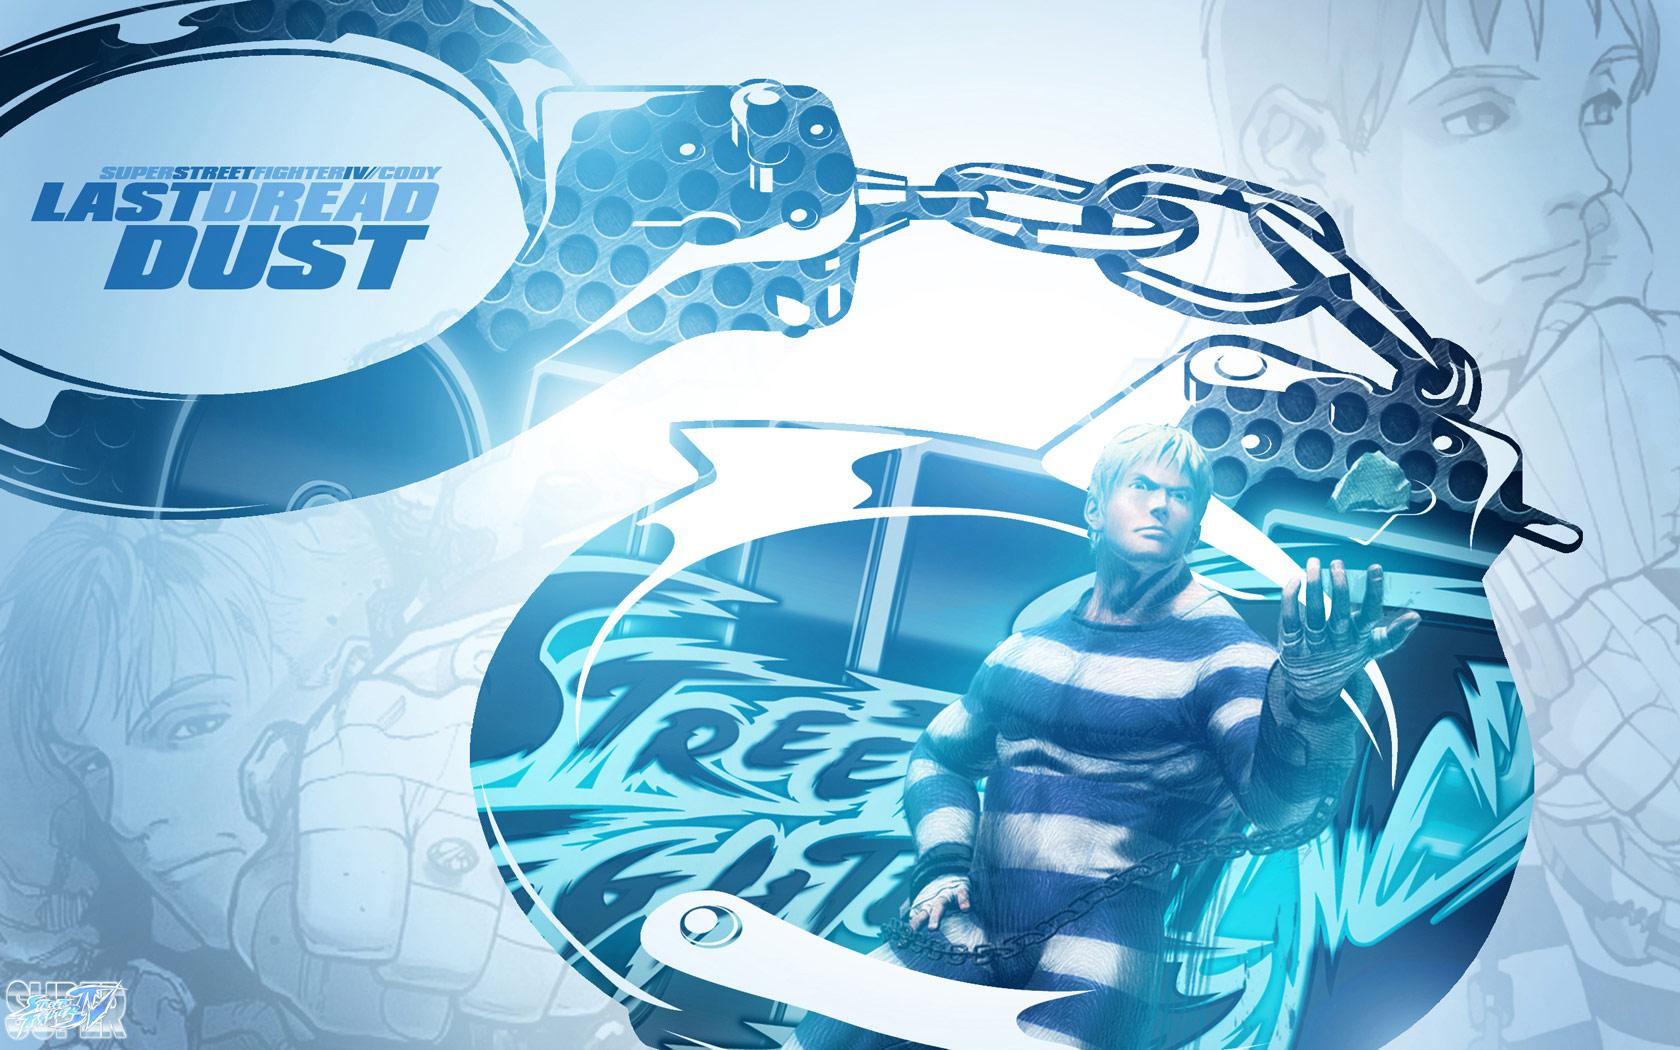 Cody Super Street Fighter 4 wallpaper by BossLogic